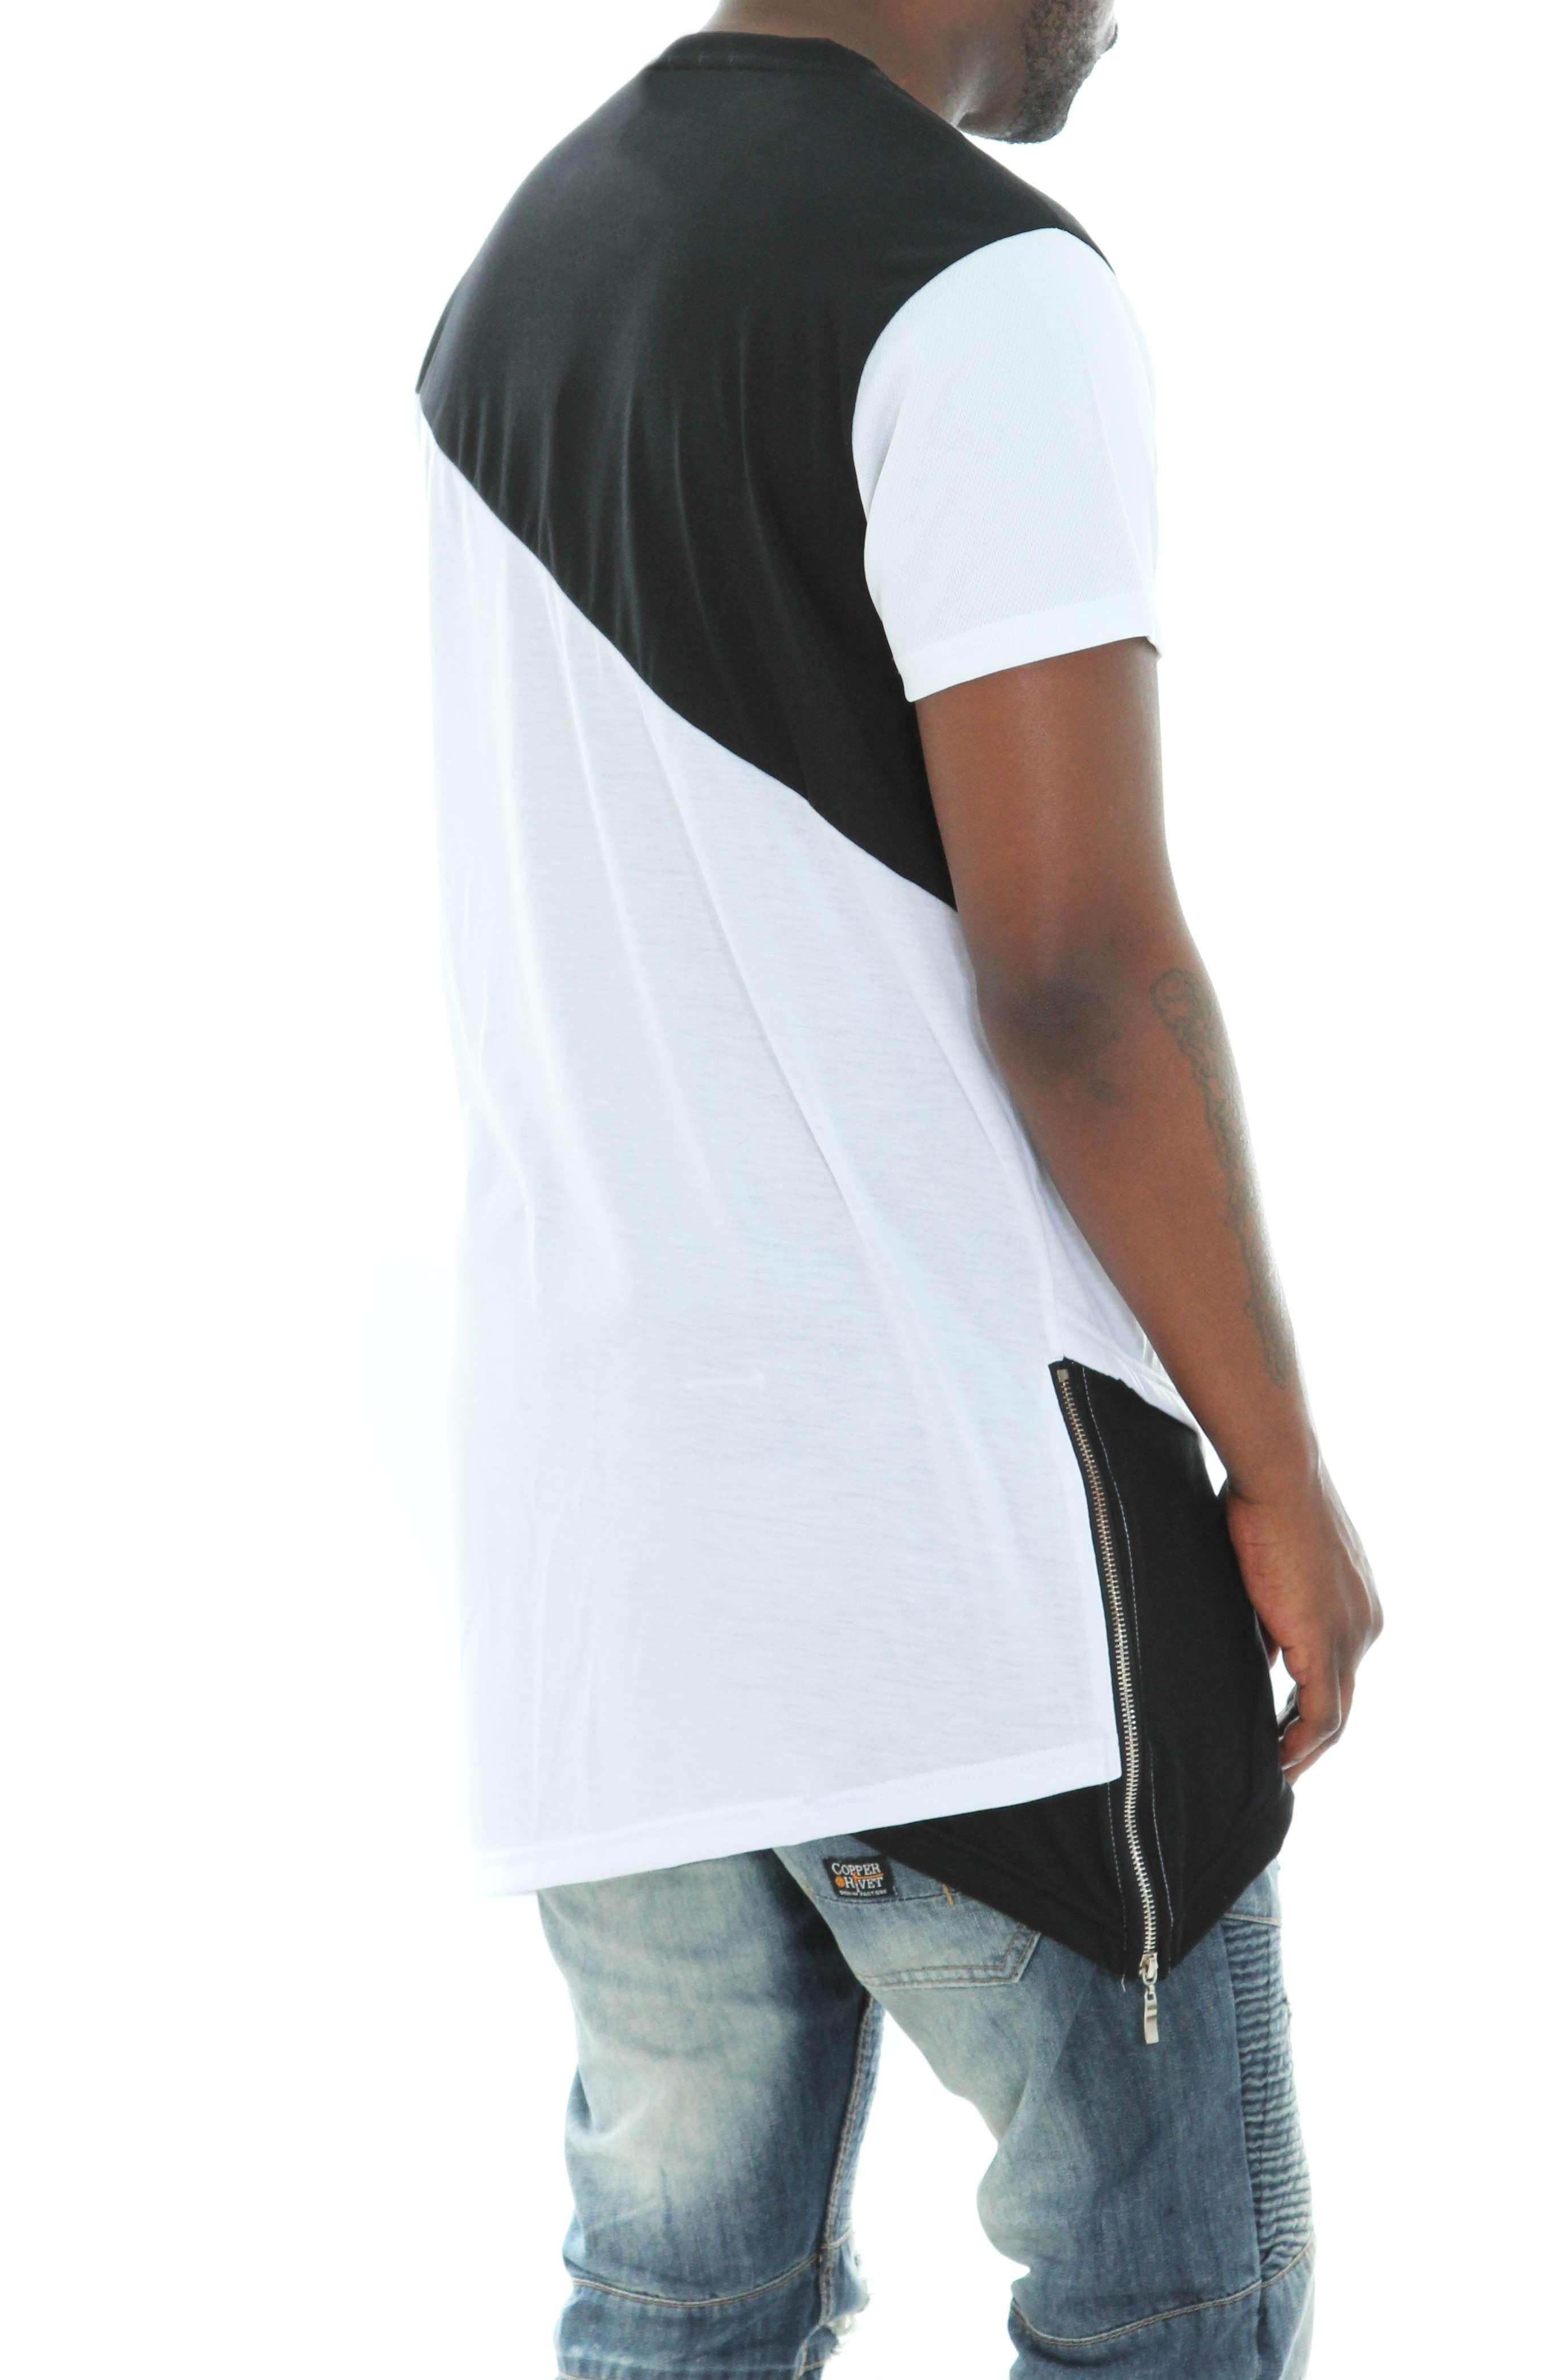 Imperious-Men-039-s-Colorblock-Asymmetric-Hem-Side-Zipper-Longline-T-Shirt thumbnail 15